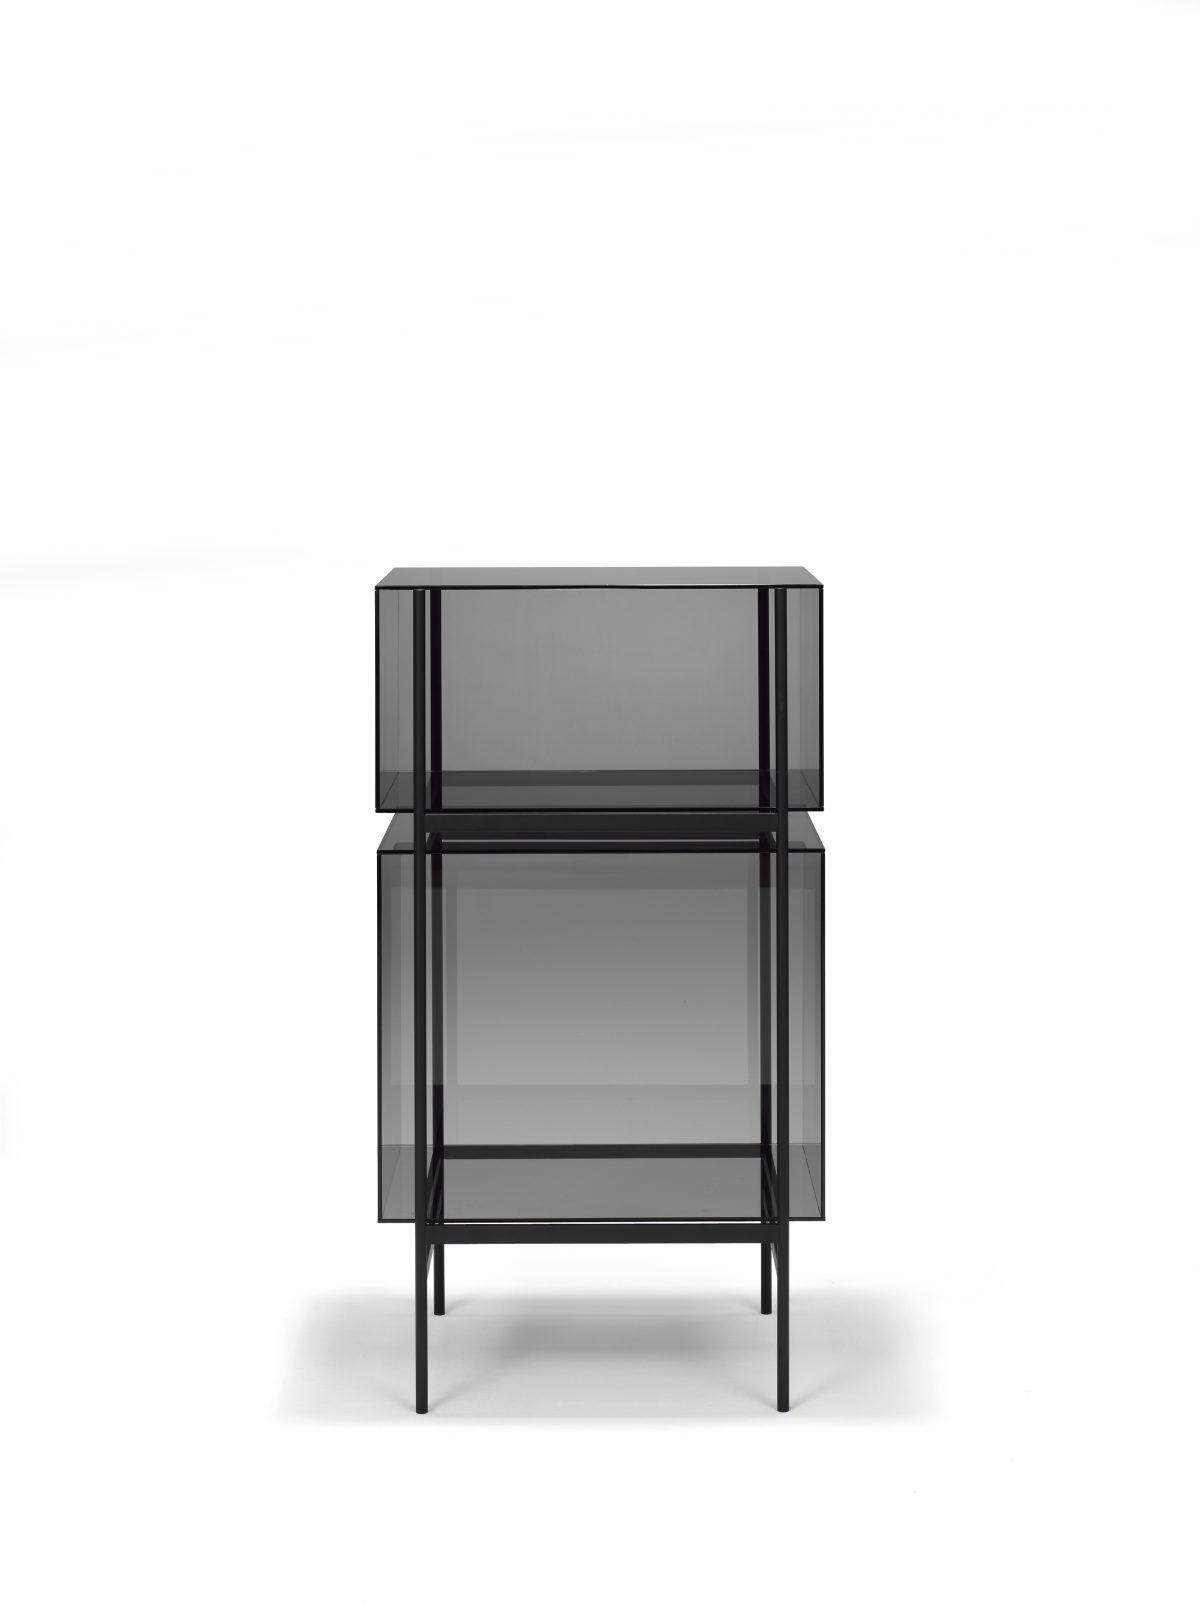 Kast LYN 2 Vakken Visser Meijwaard Luxe Dutchdesign Kast Zwart Frame Grijs Glas JOSHH& 12